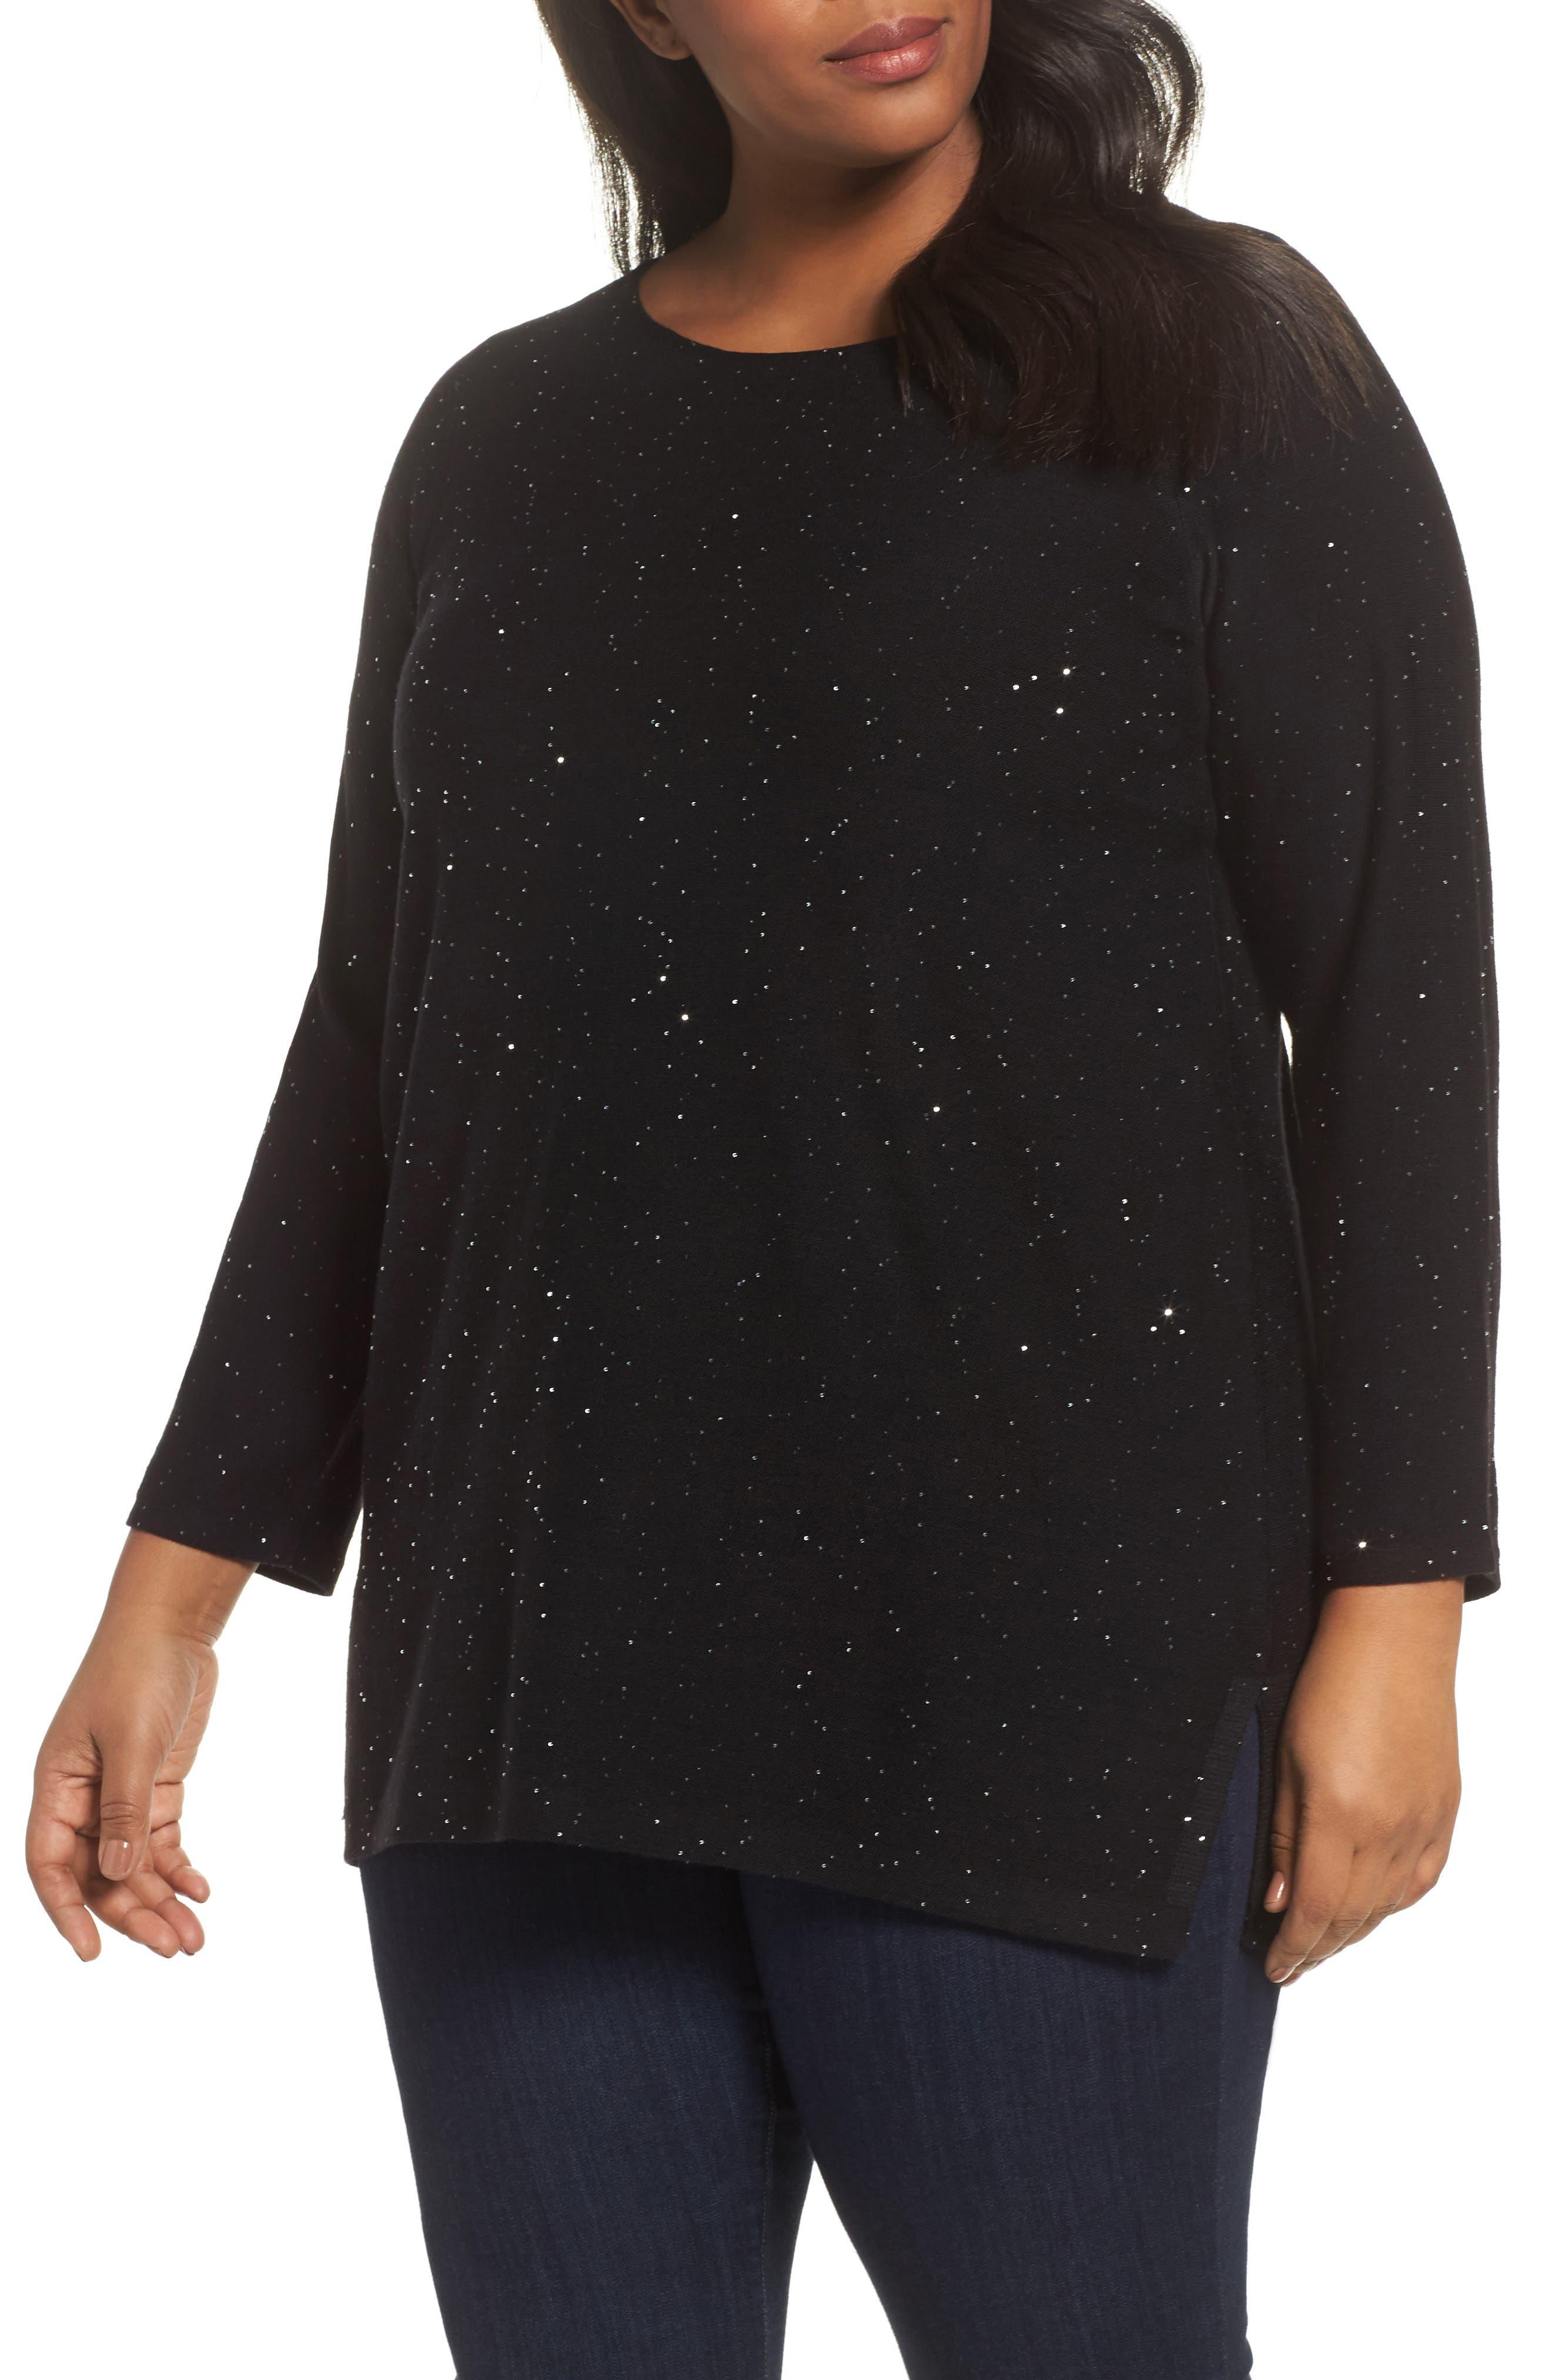 Main Image - Eileen Fisher Sequin Merino Wool Tunic Sweater (Plus Size)